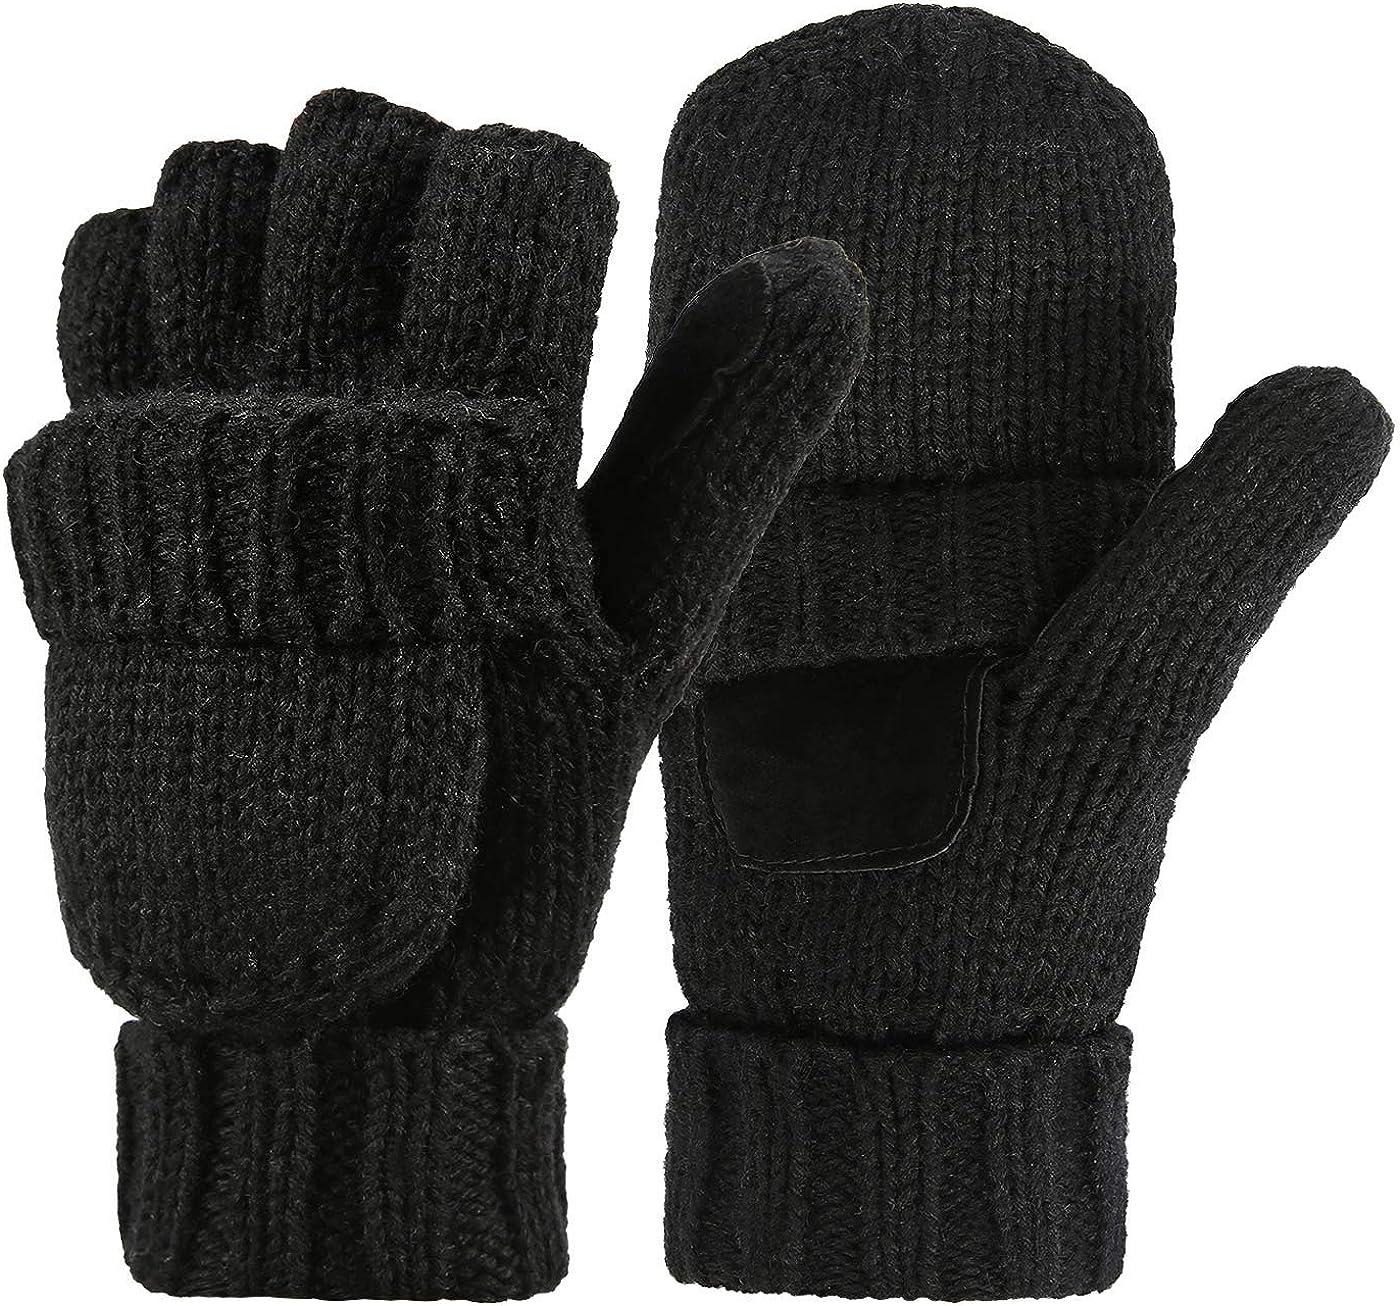 Variety To Go Winter Knitted Fingerless Gloves Convertible Wool Mittens Warm Glove Women & Men